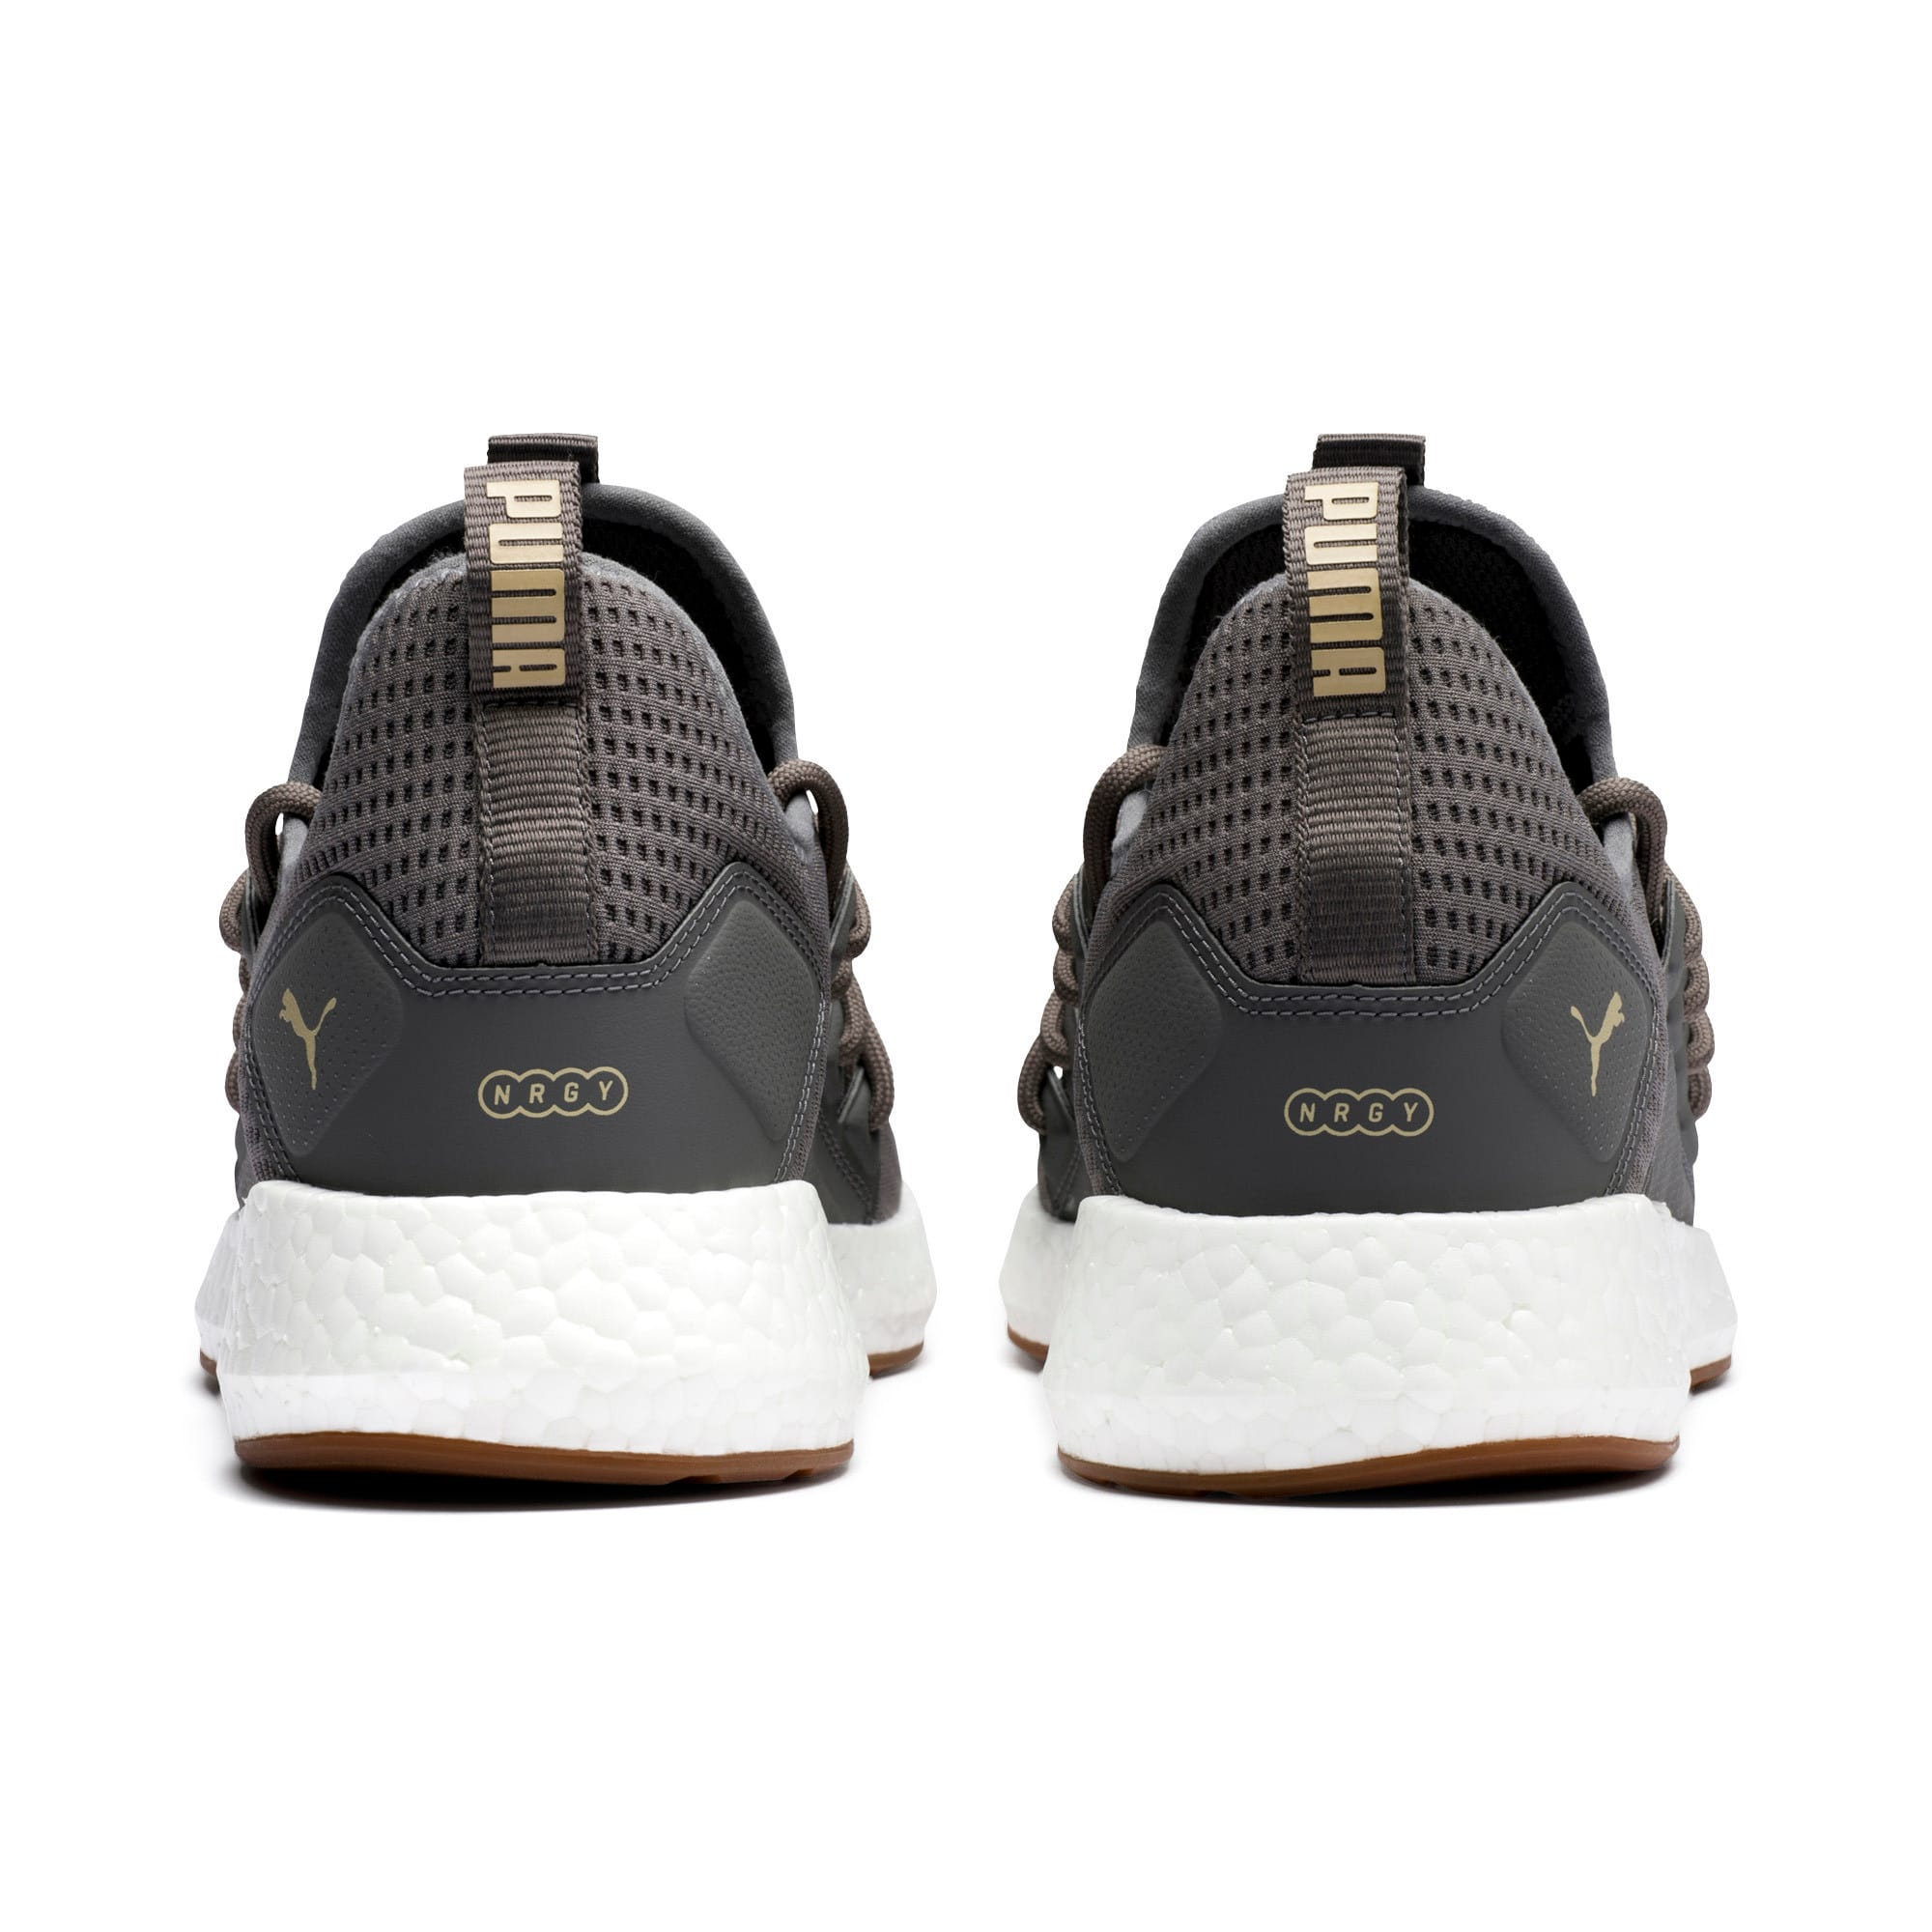 Thumbnail 3 of NRGY Neko Future Men's Running Shoes, Charcoal Gray-Taos Taupe, medium